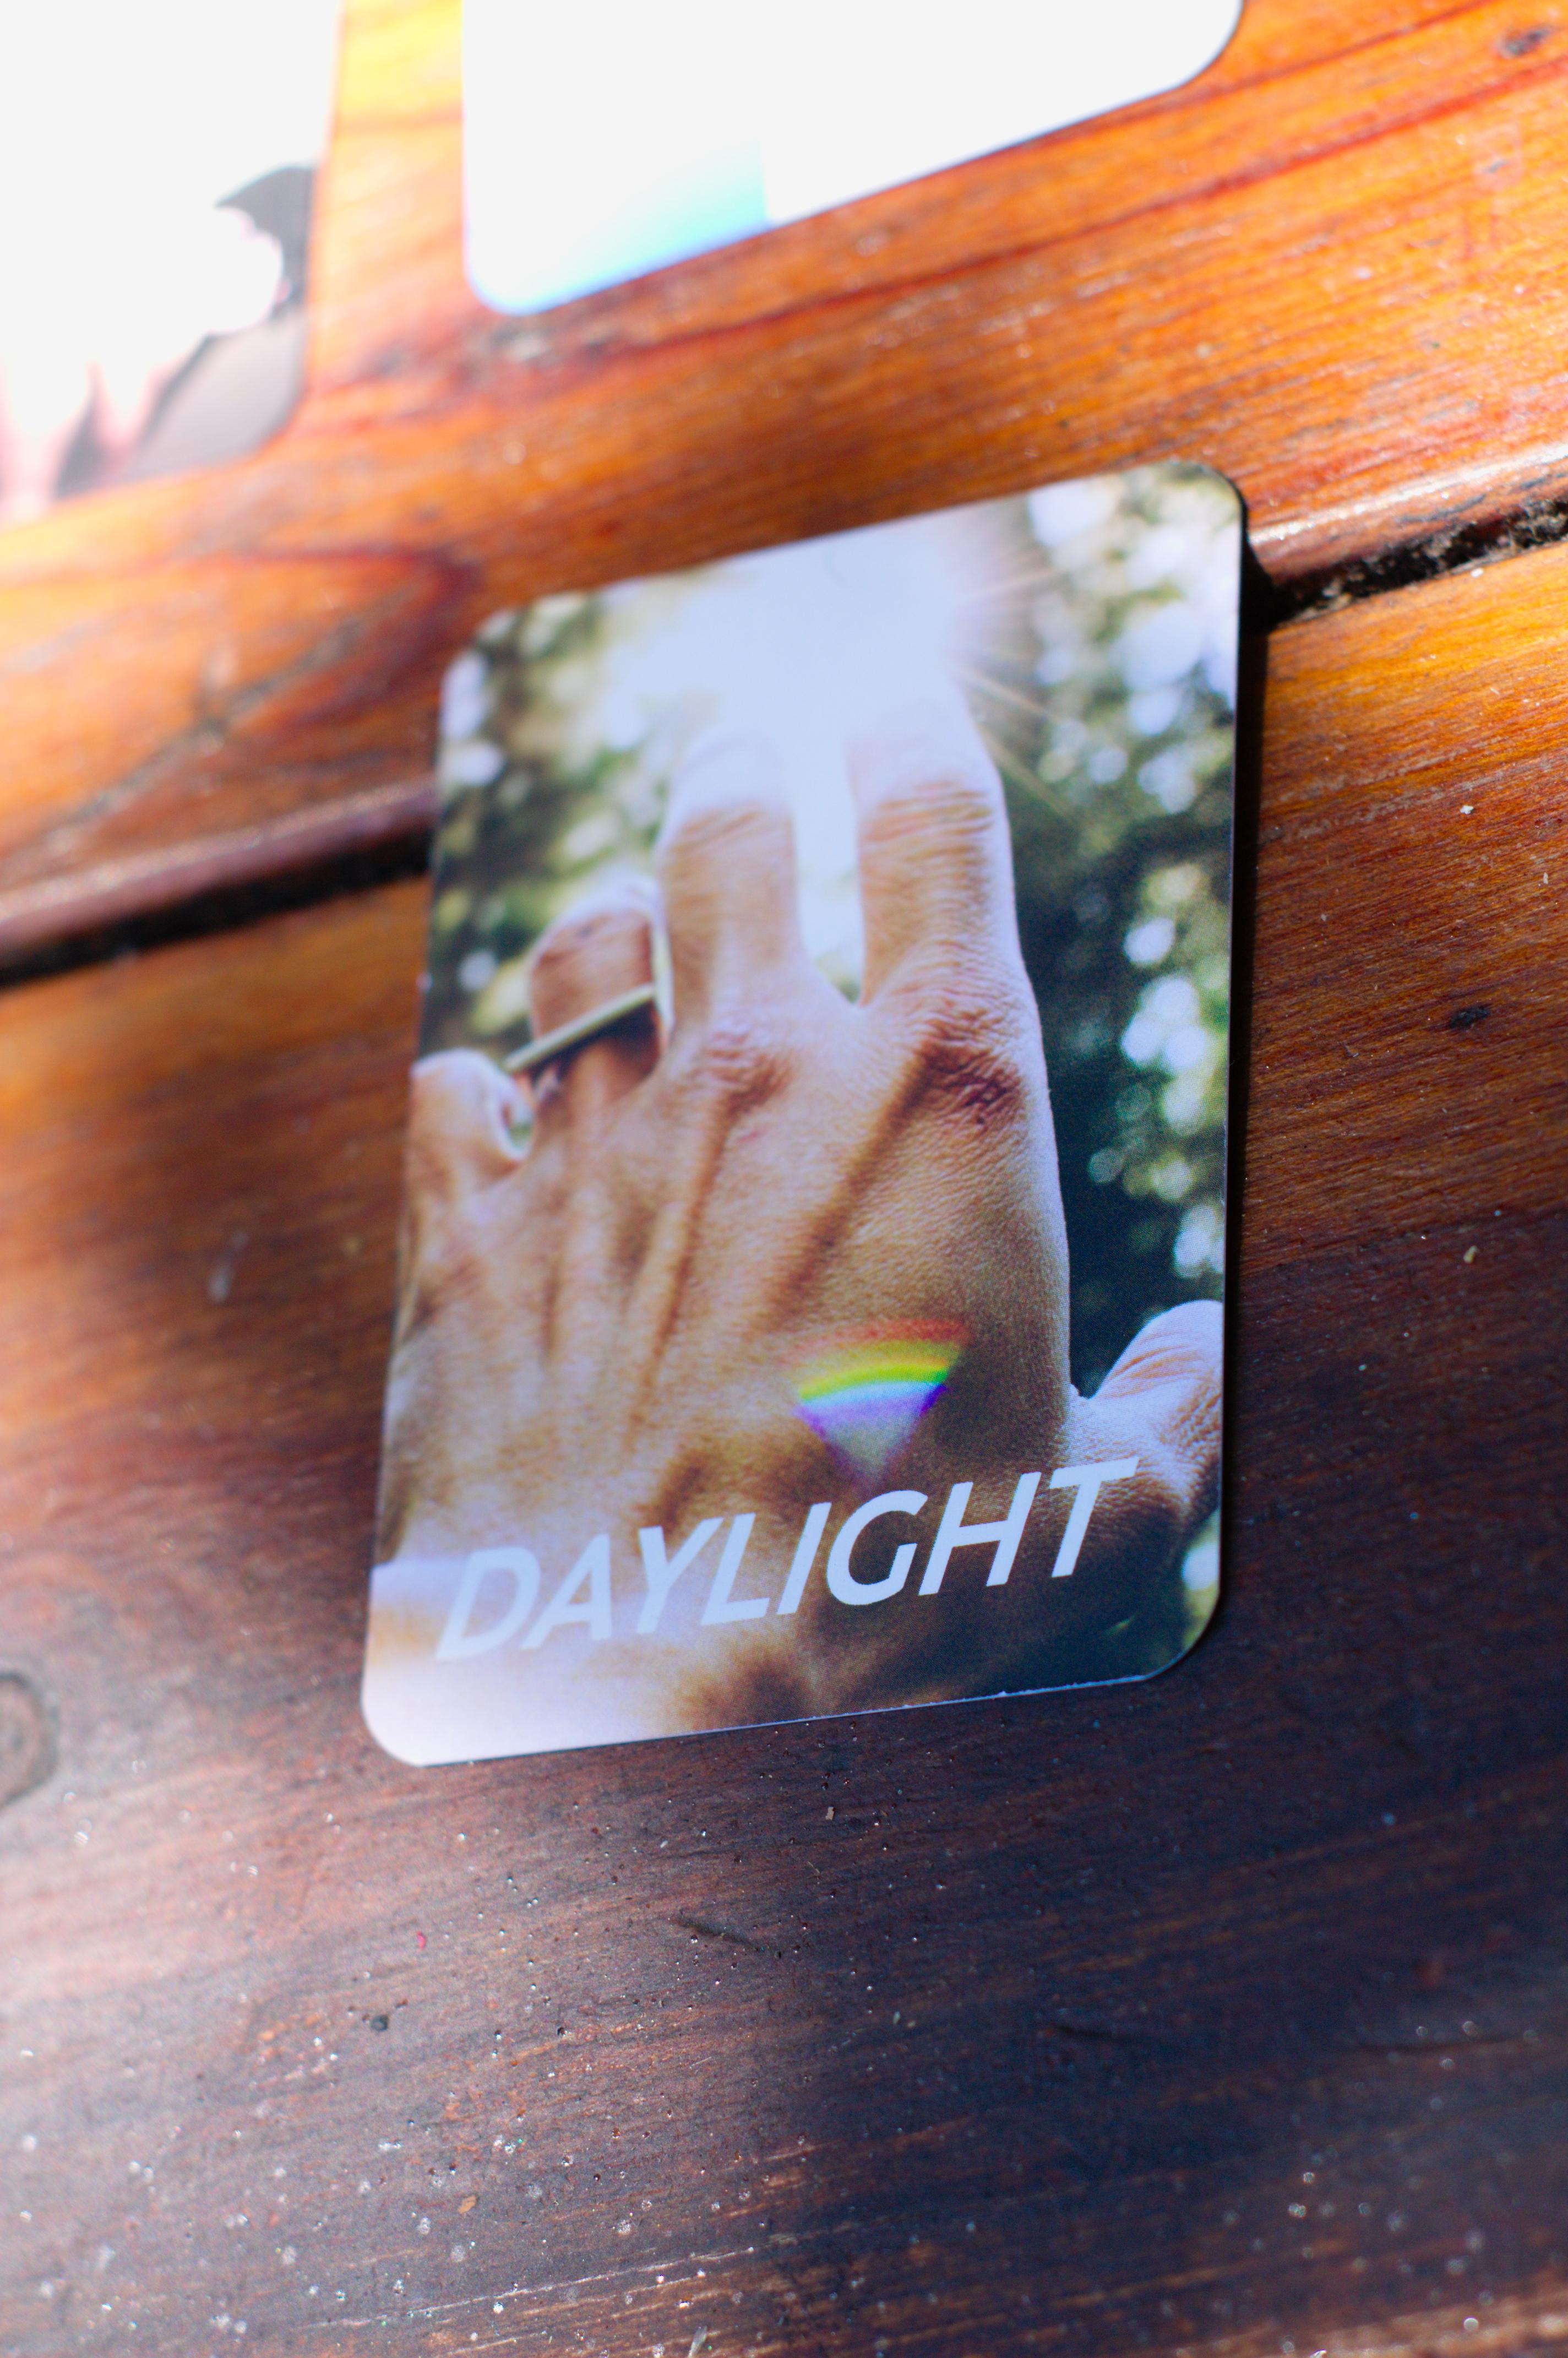 Daylight game